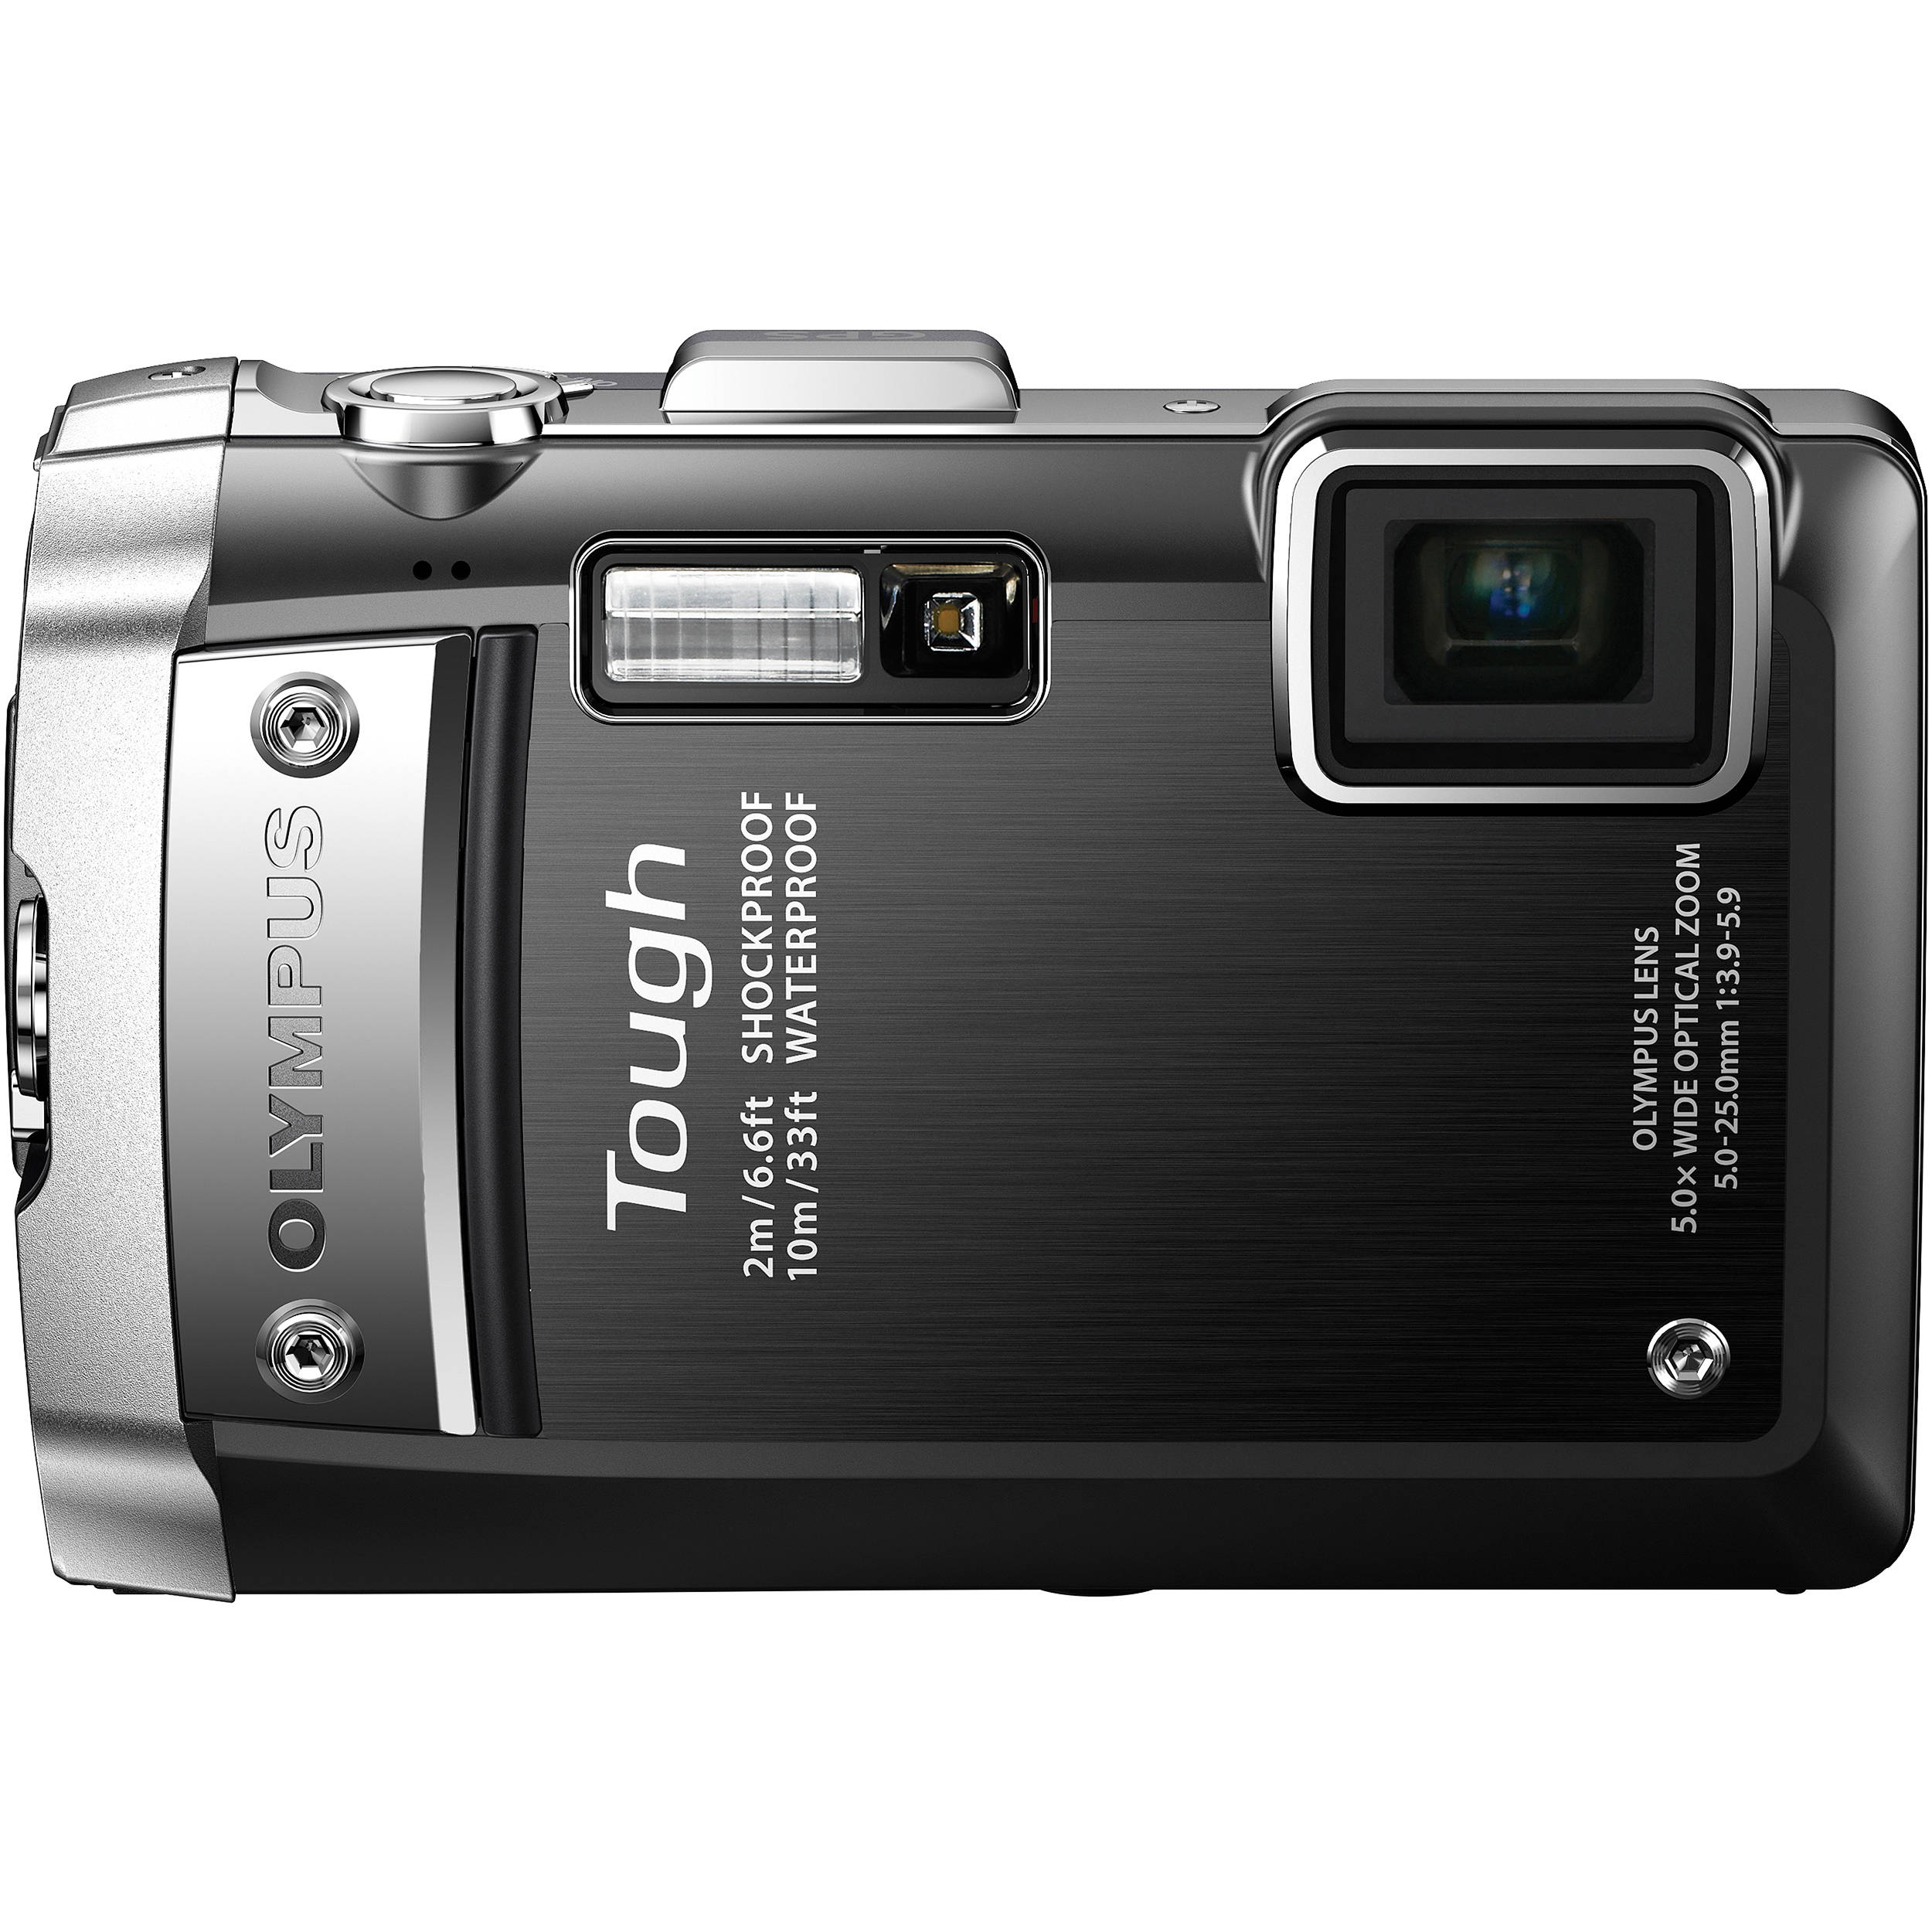 Olympus Digital Camera: Olympus Tough TG-810 Digital Camera (Black) 228100 B&H Photo